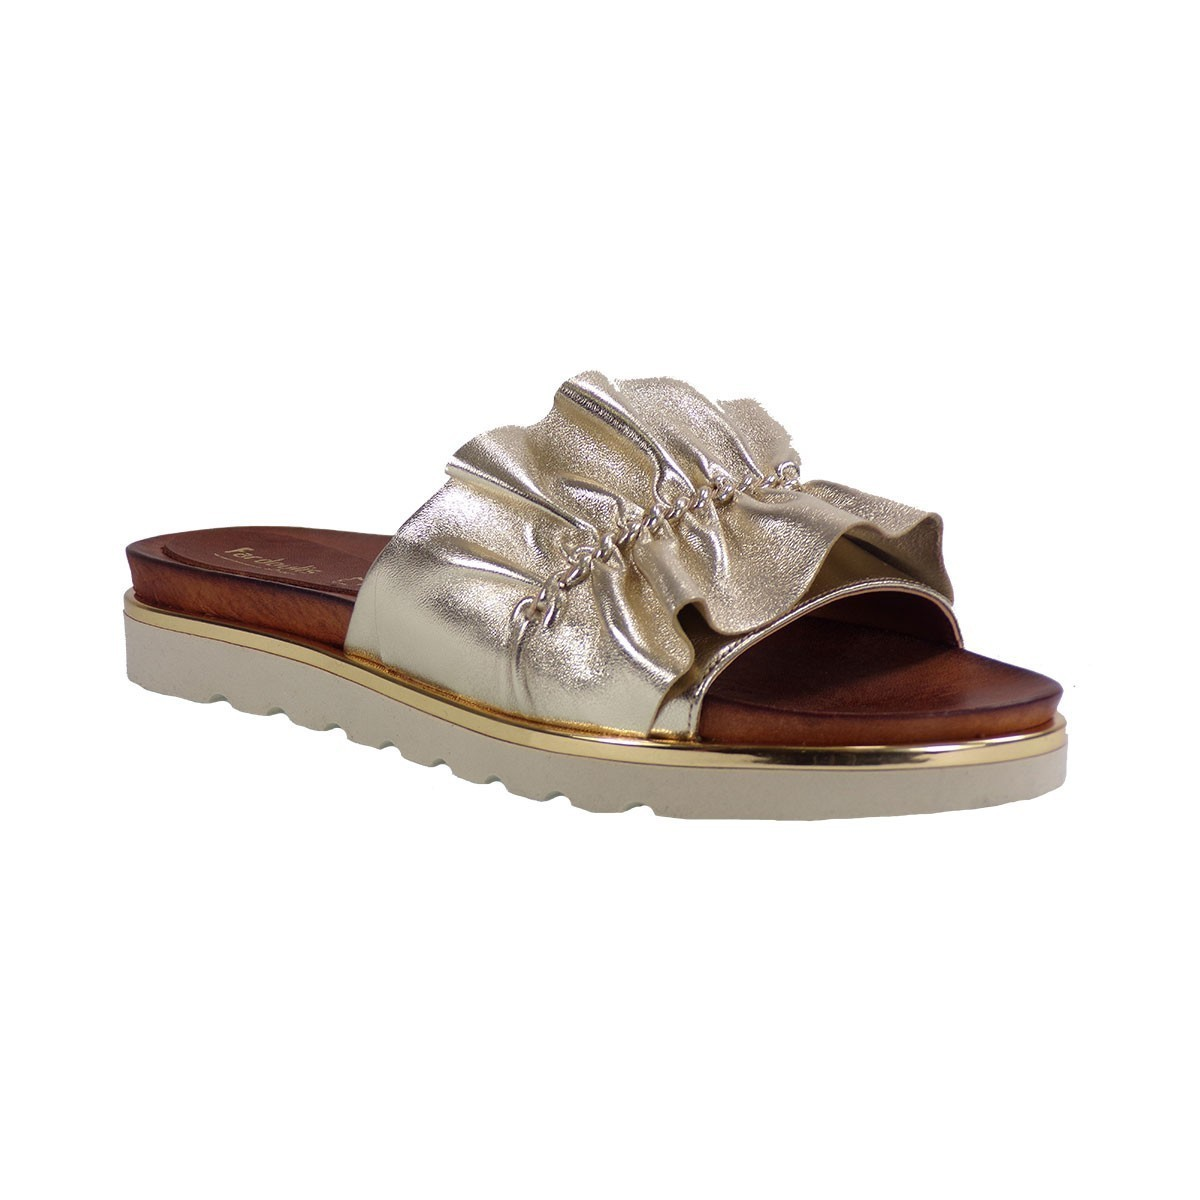 Fardoulis Shoes Γυναικεία Παντόφλα 35091 Πλατίνα Δέρμα